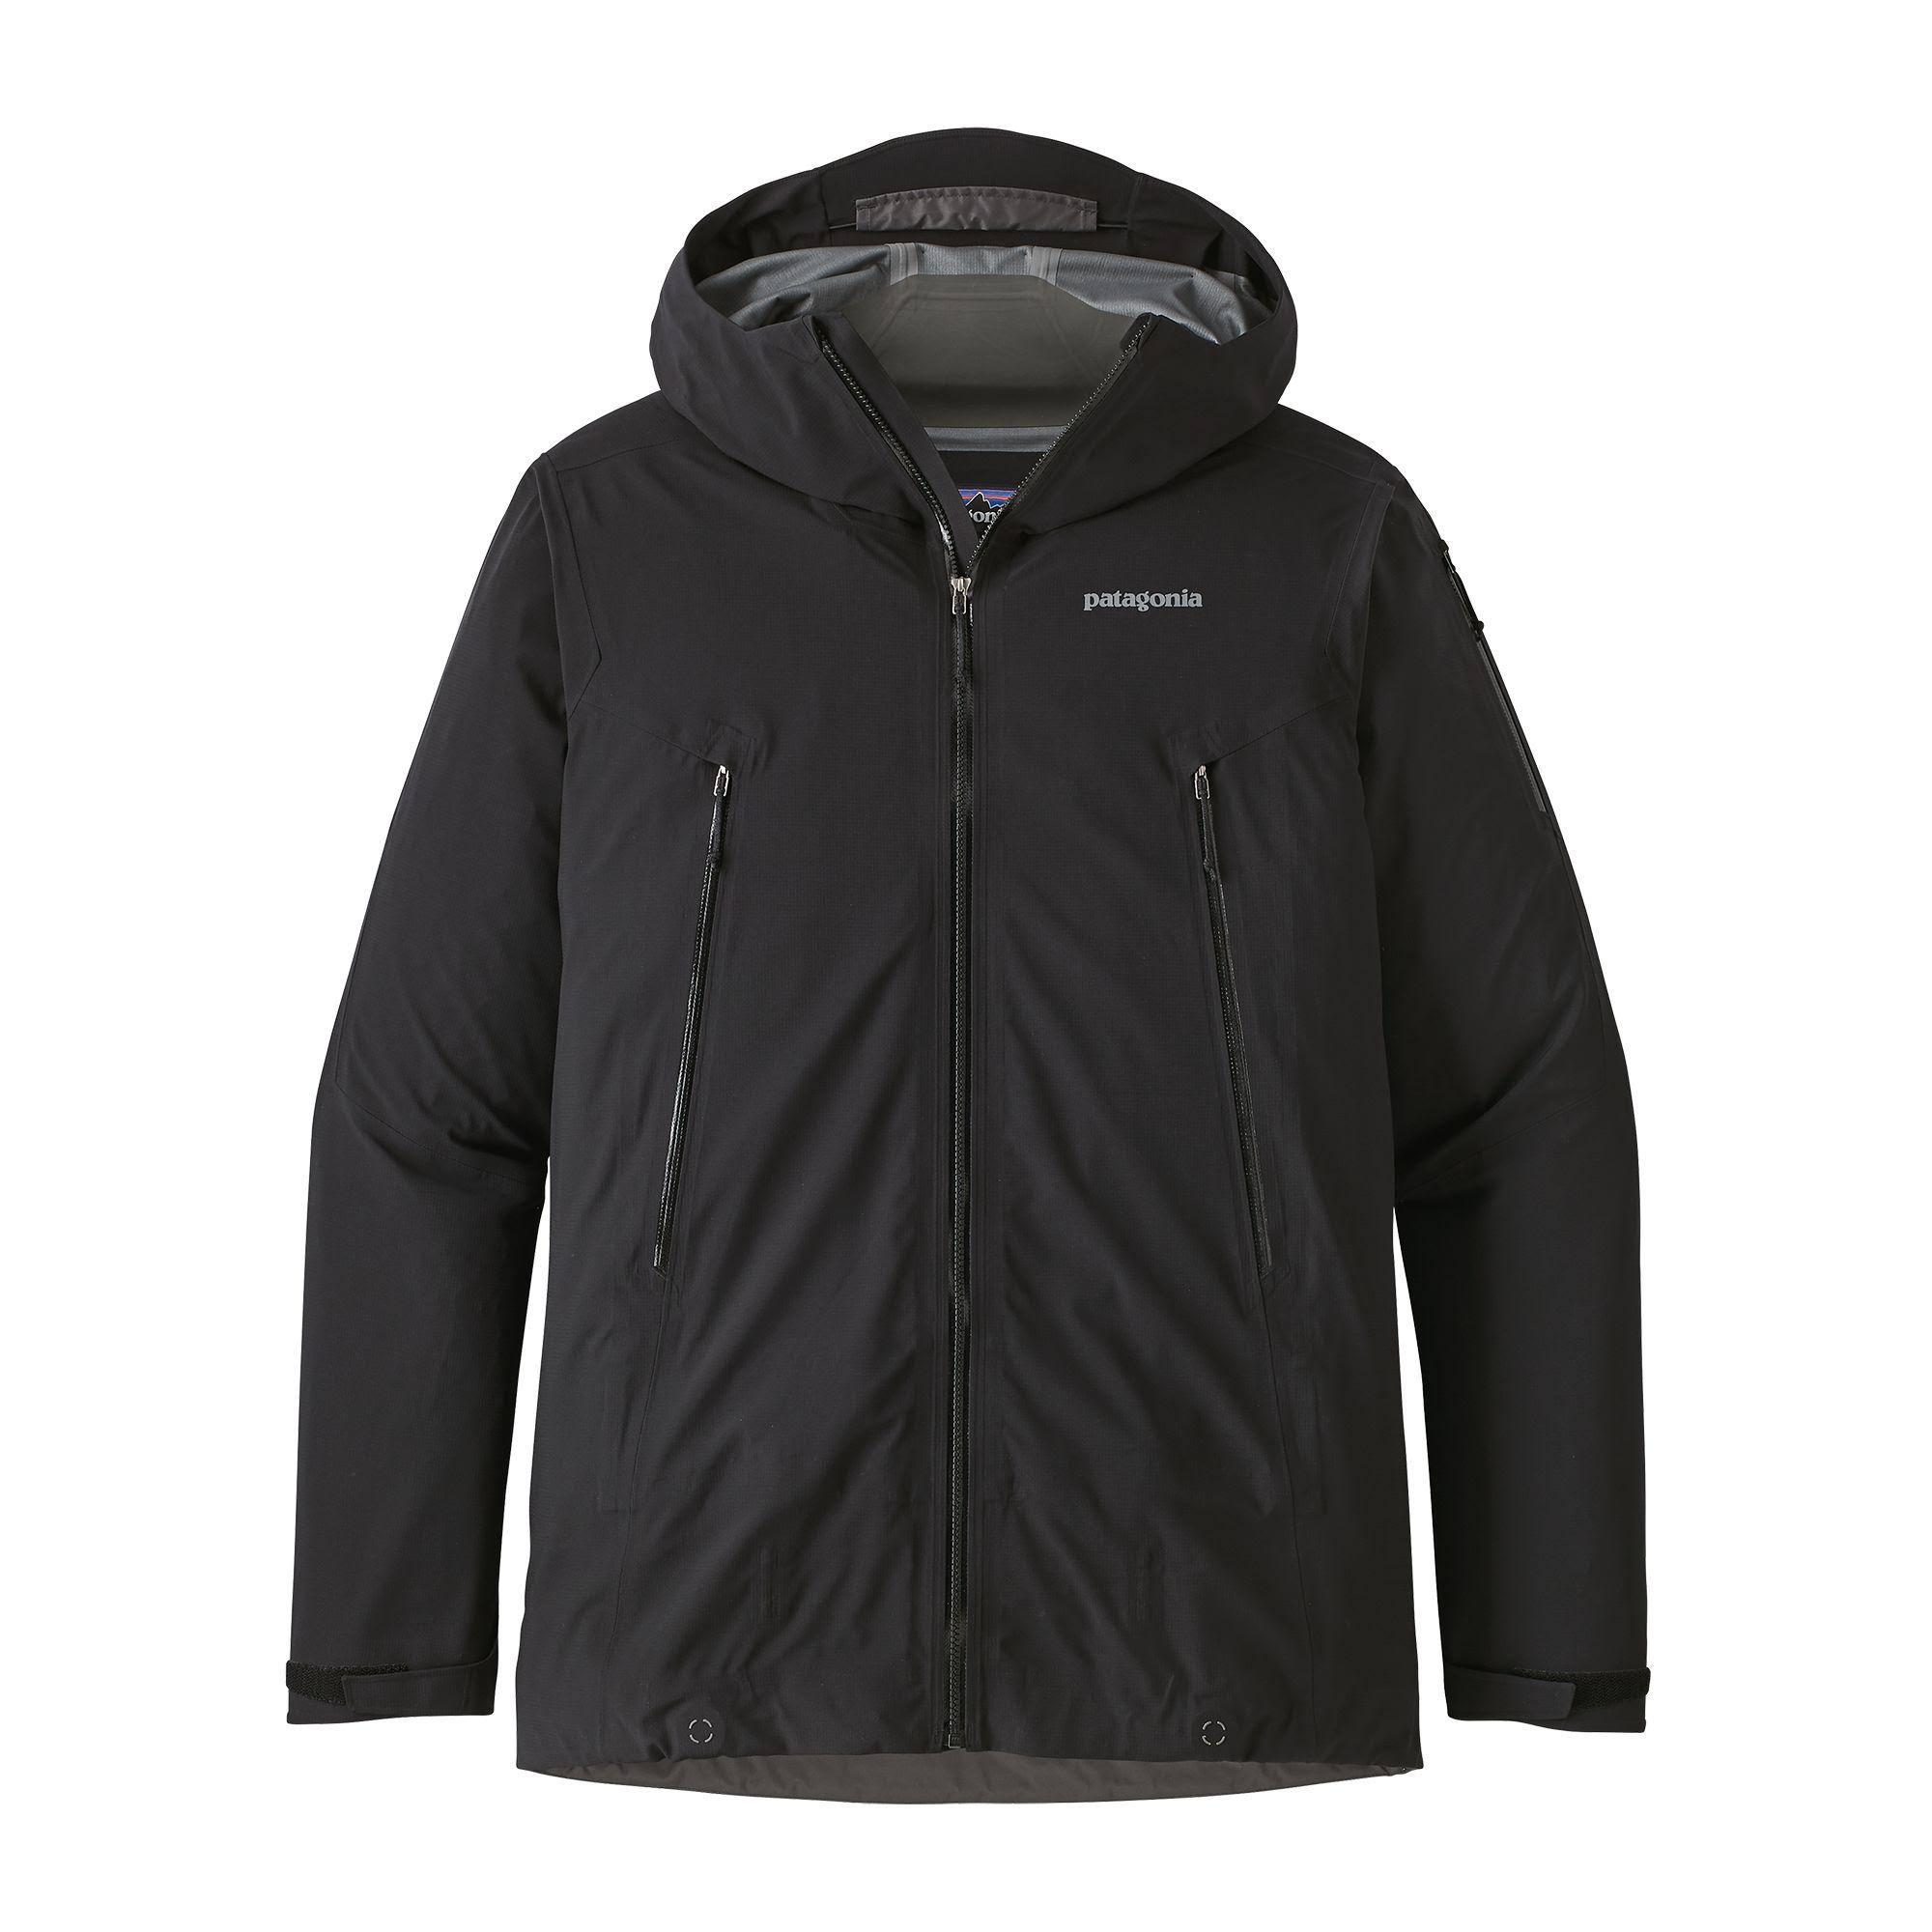 Schwarz Patagonia Herren Jacket Large Descensionist tXxatB4qw